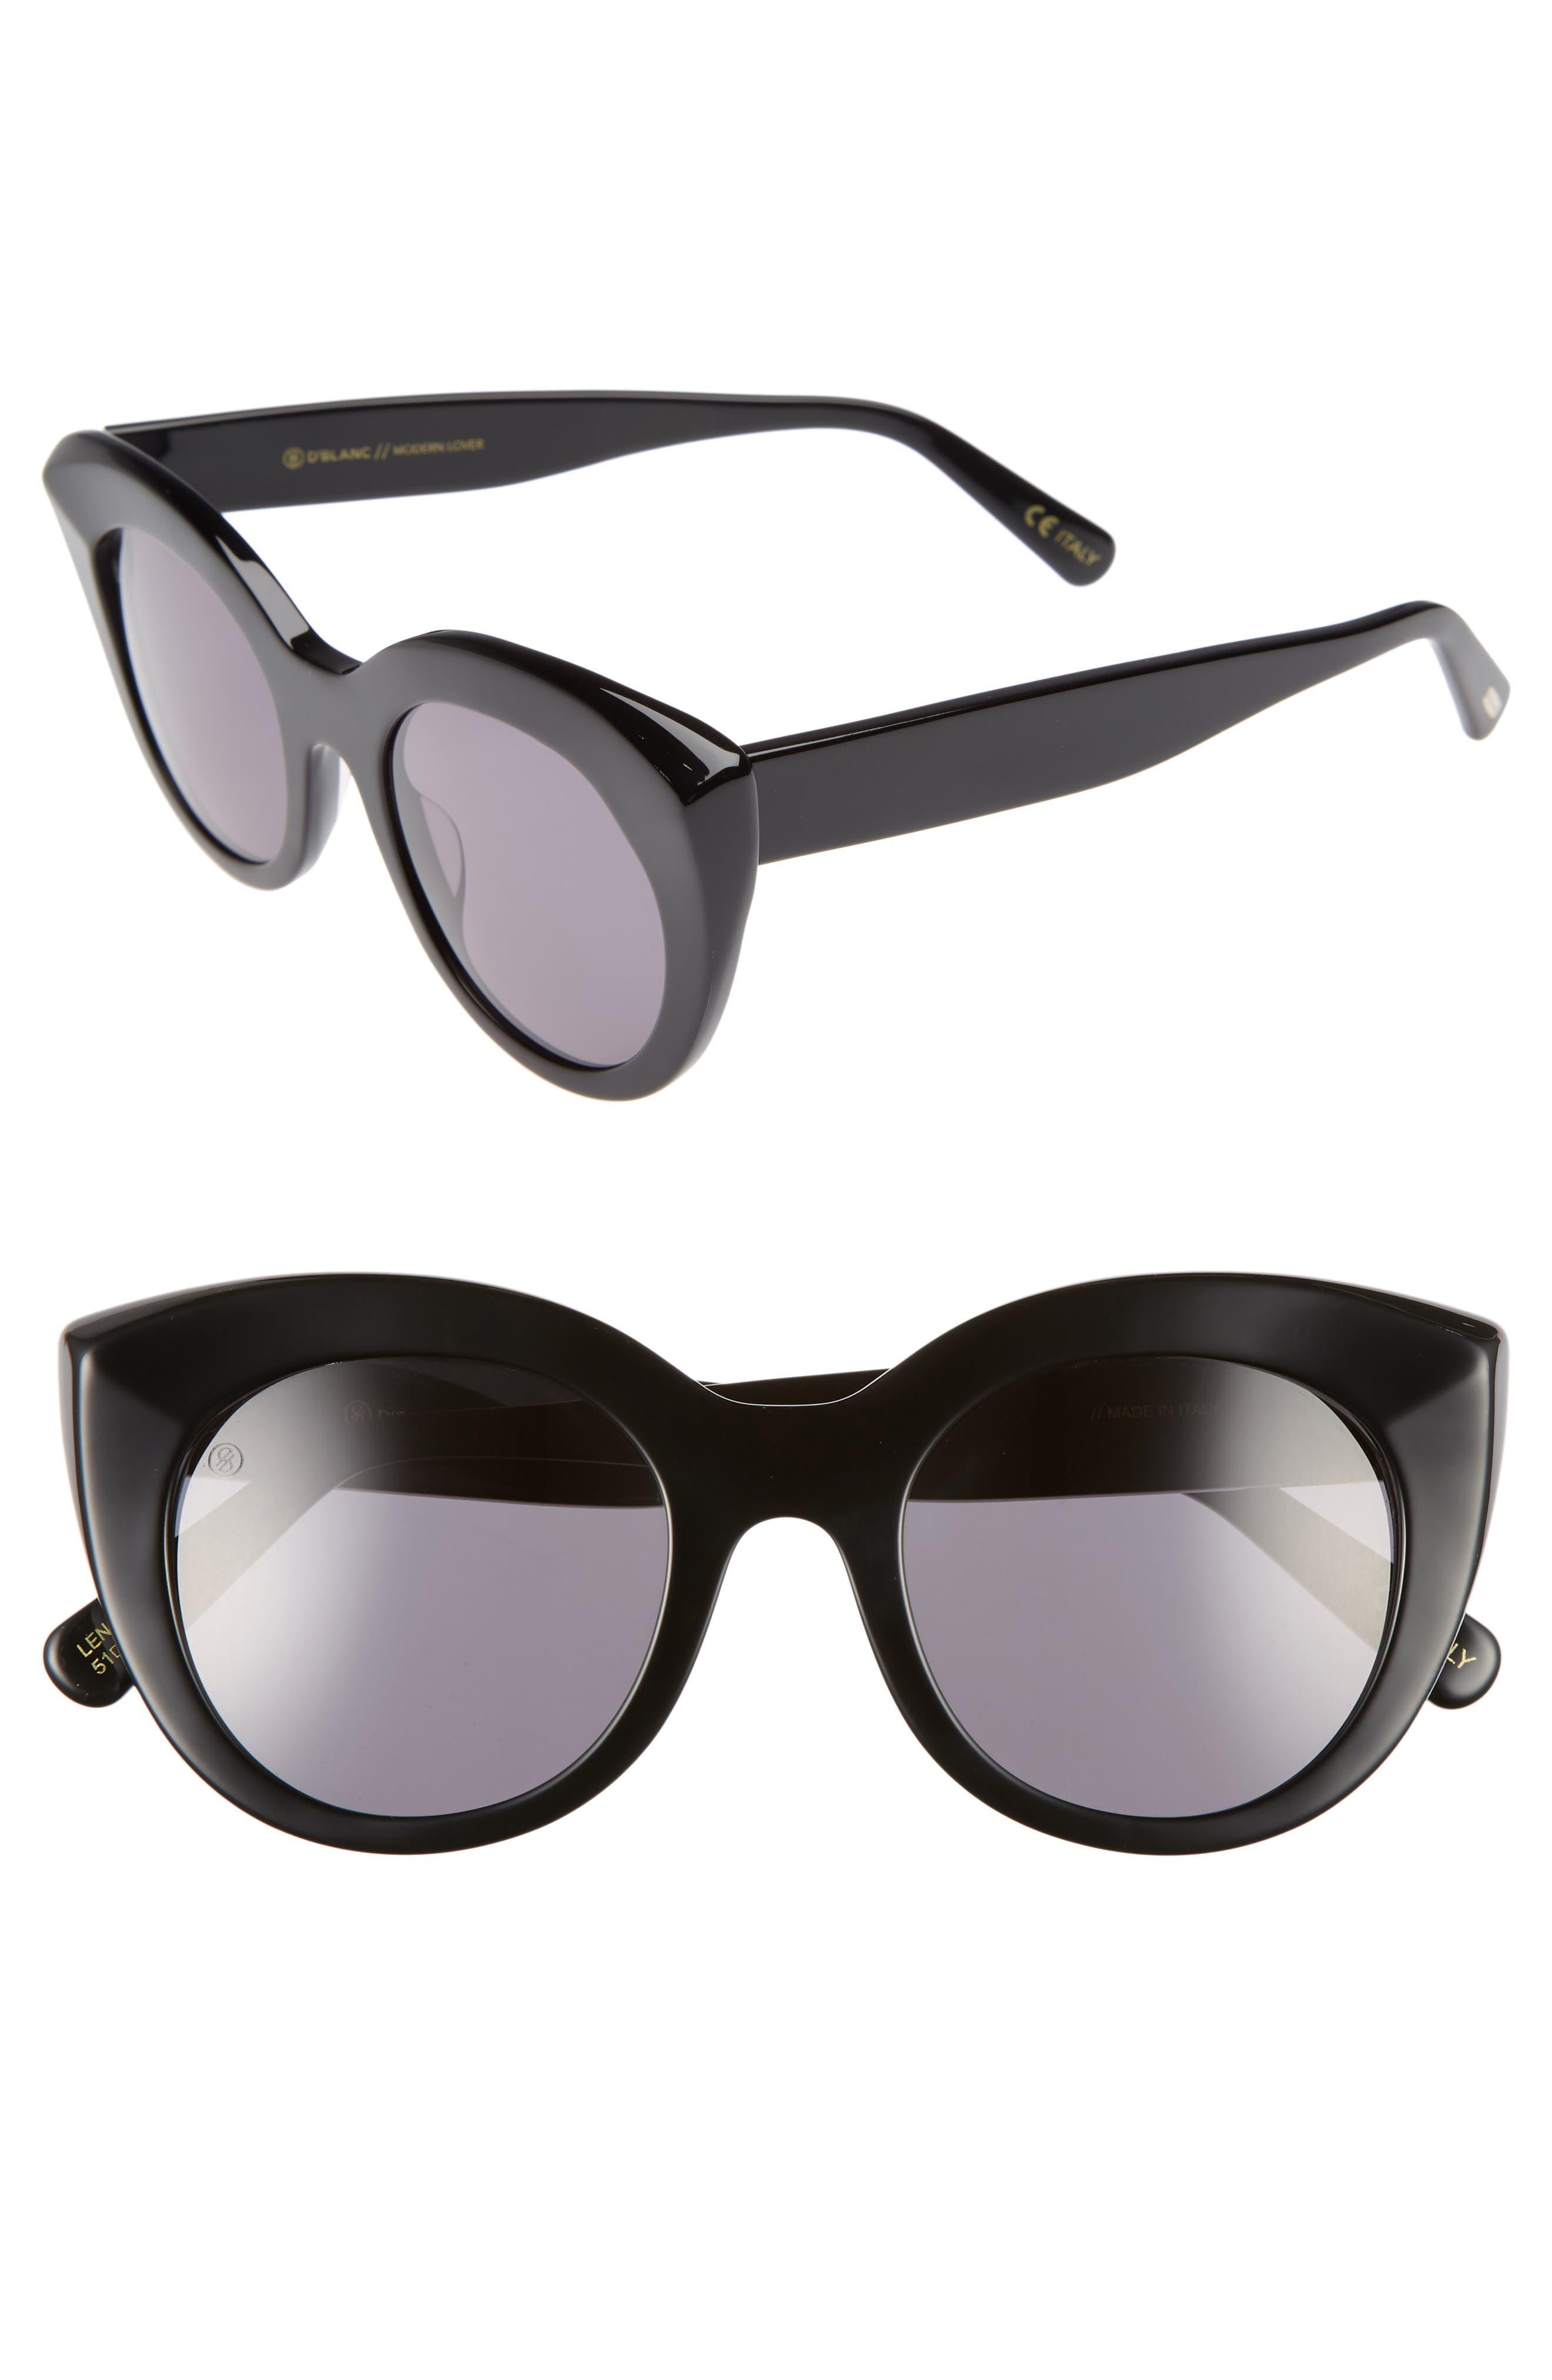 D'BLANC Modern Lover 49mm Cat-Eye Sunglasses,                             Main thumbnail 1, color,                             001